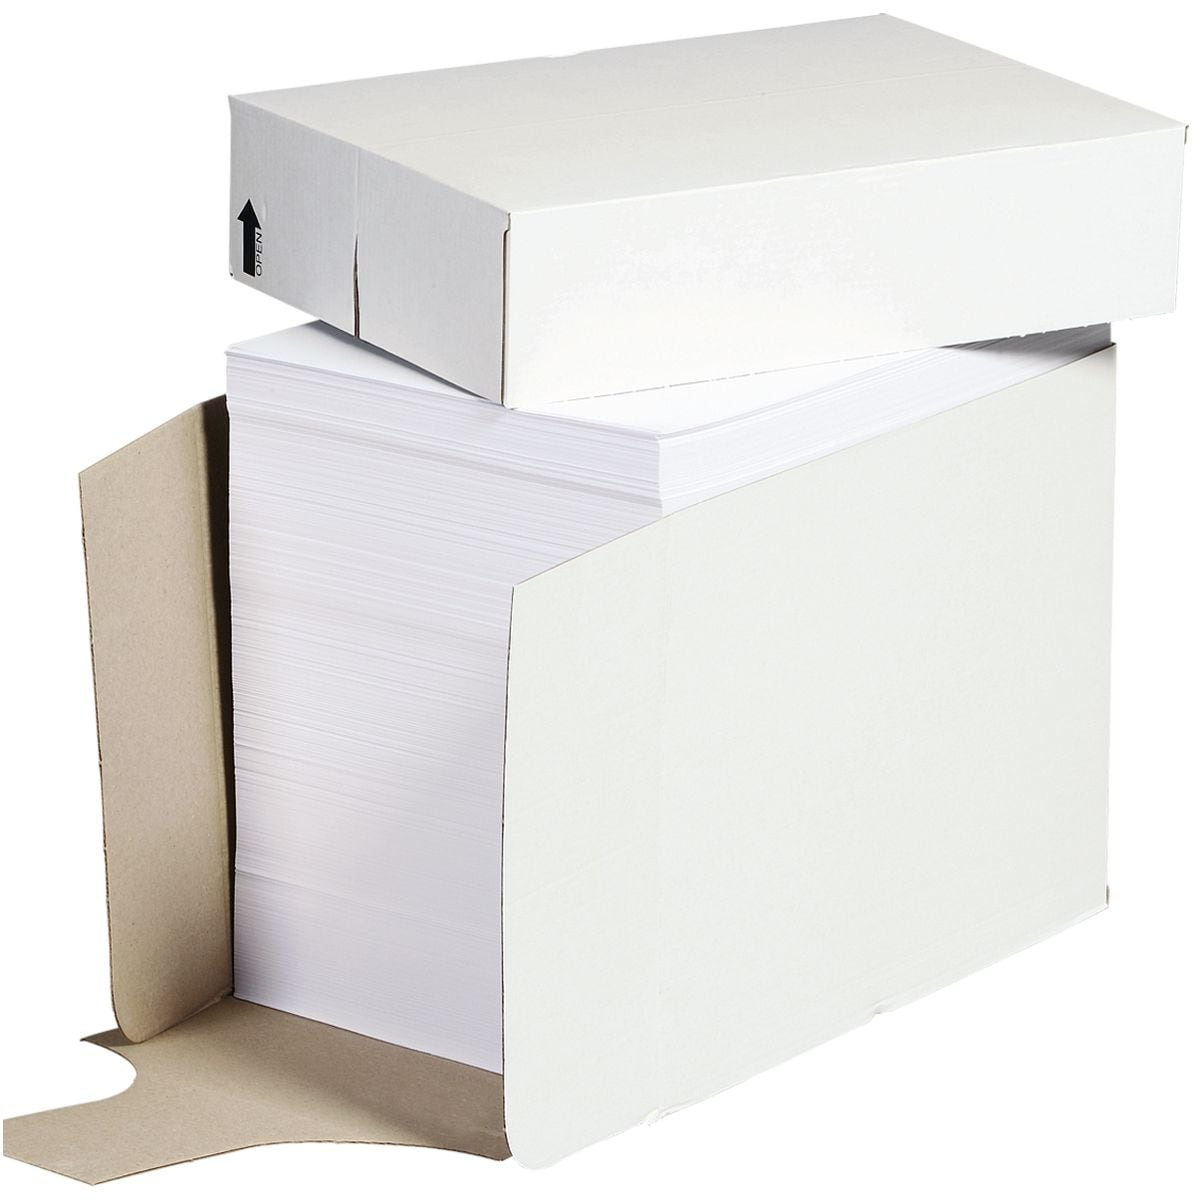 ko box kopierpapier a4 2500 blatt gesamt 80 g m bei otto office g nstig kaufen. Black Bedroom Furniture Sets. Home Design Ideas